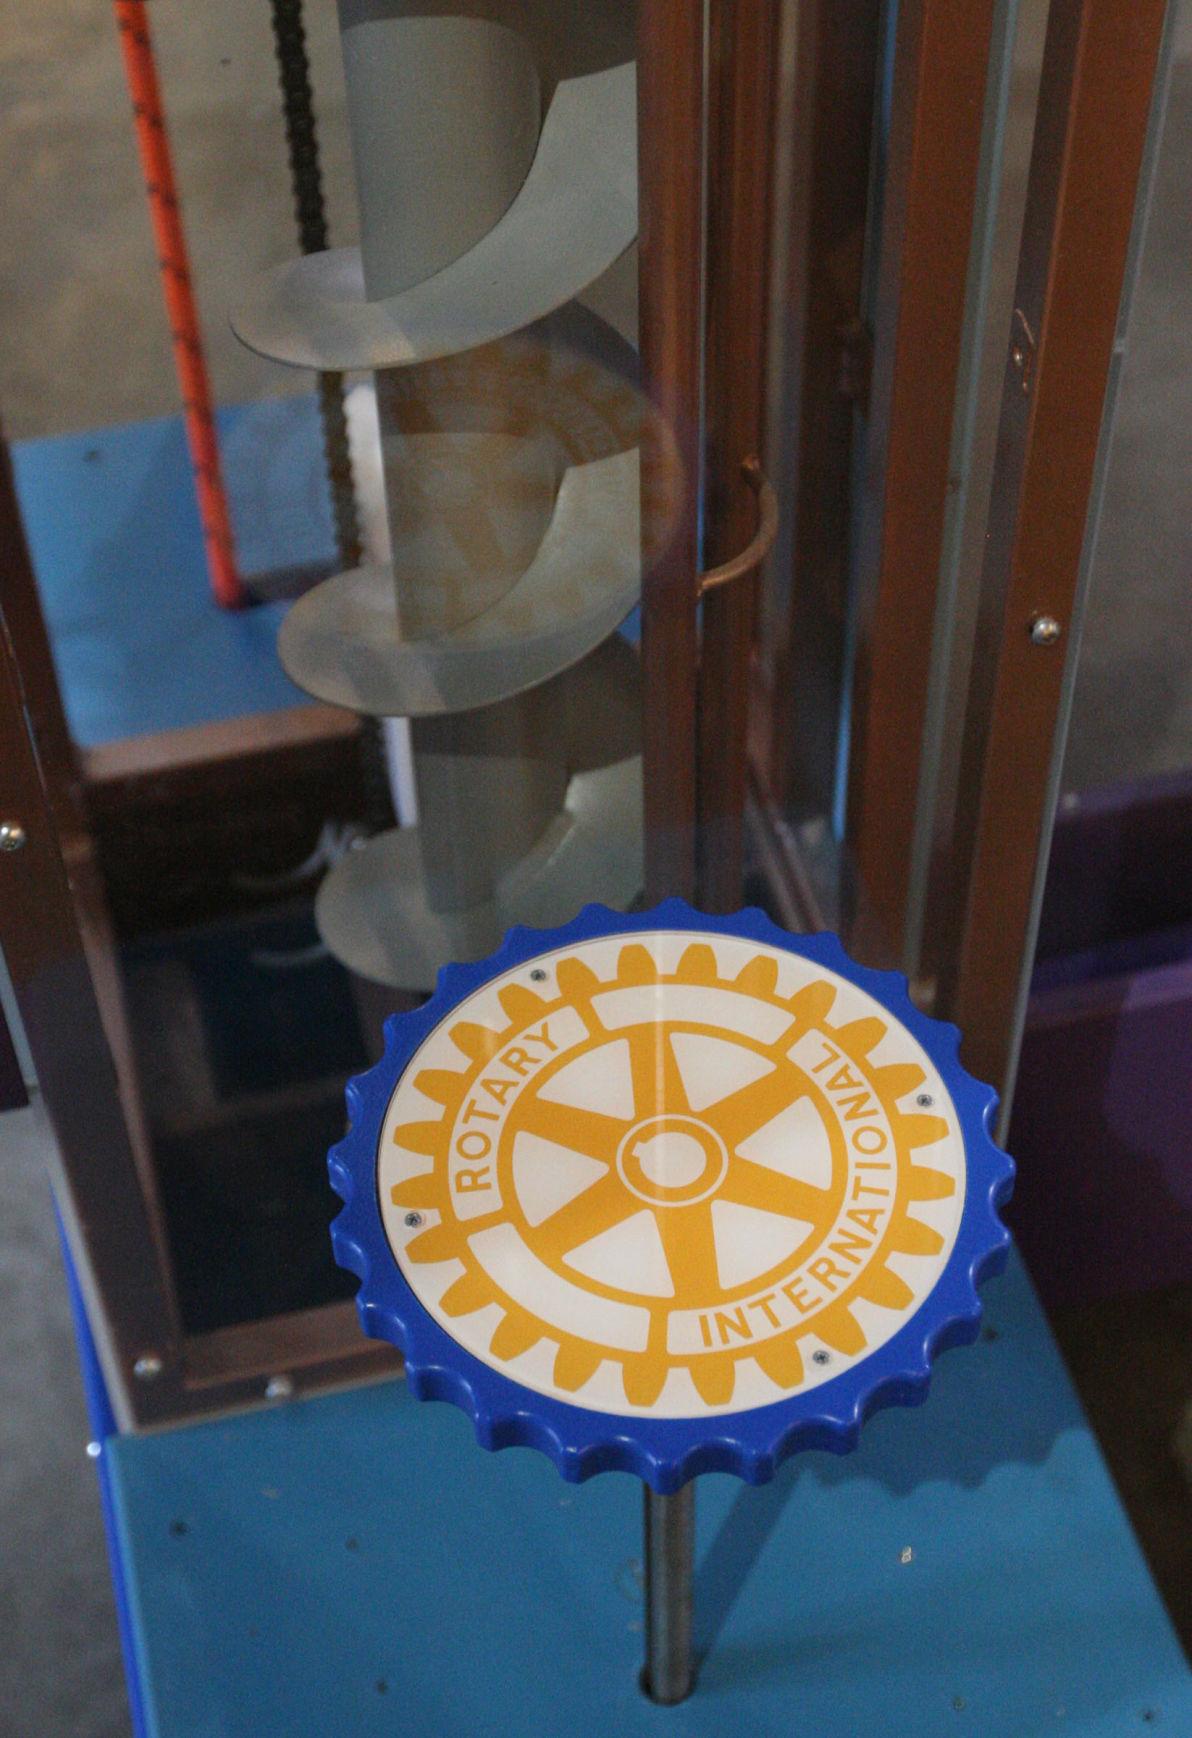 Drink Clean Water rotary wheel 9.25.17